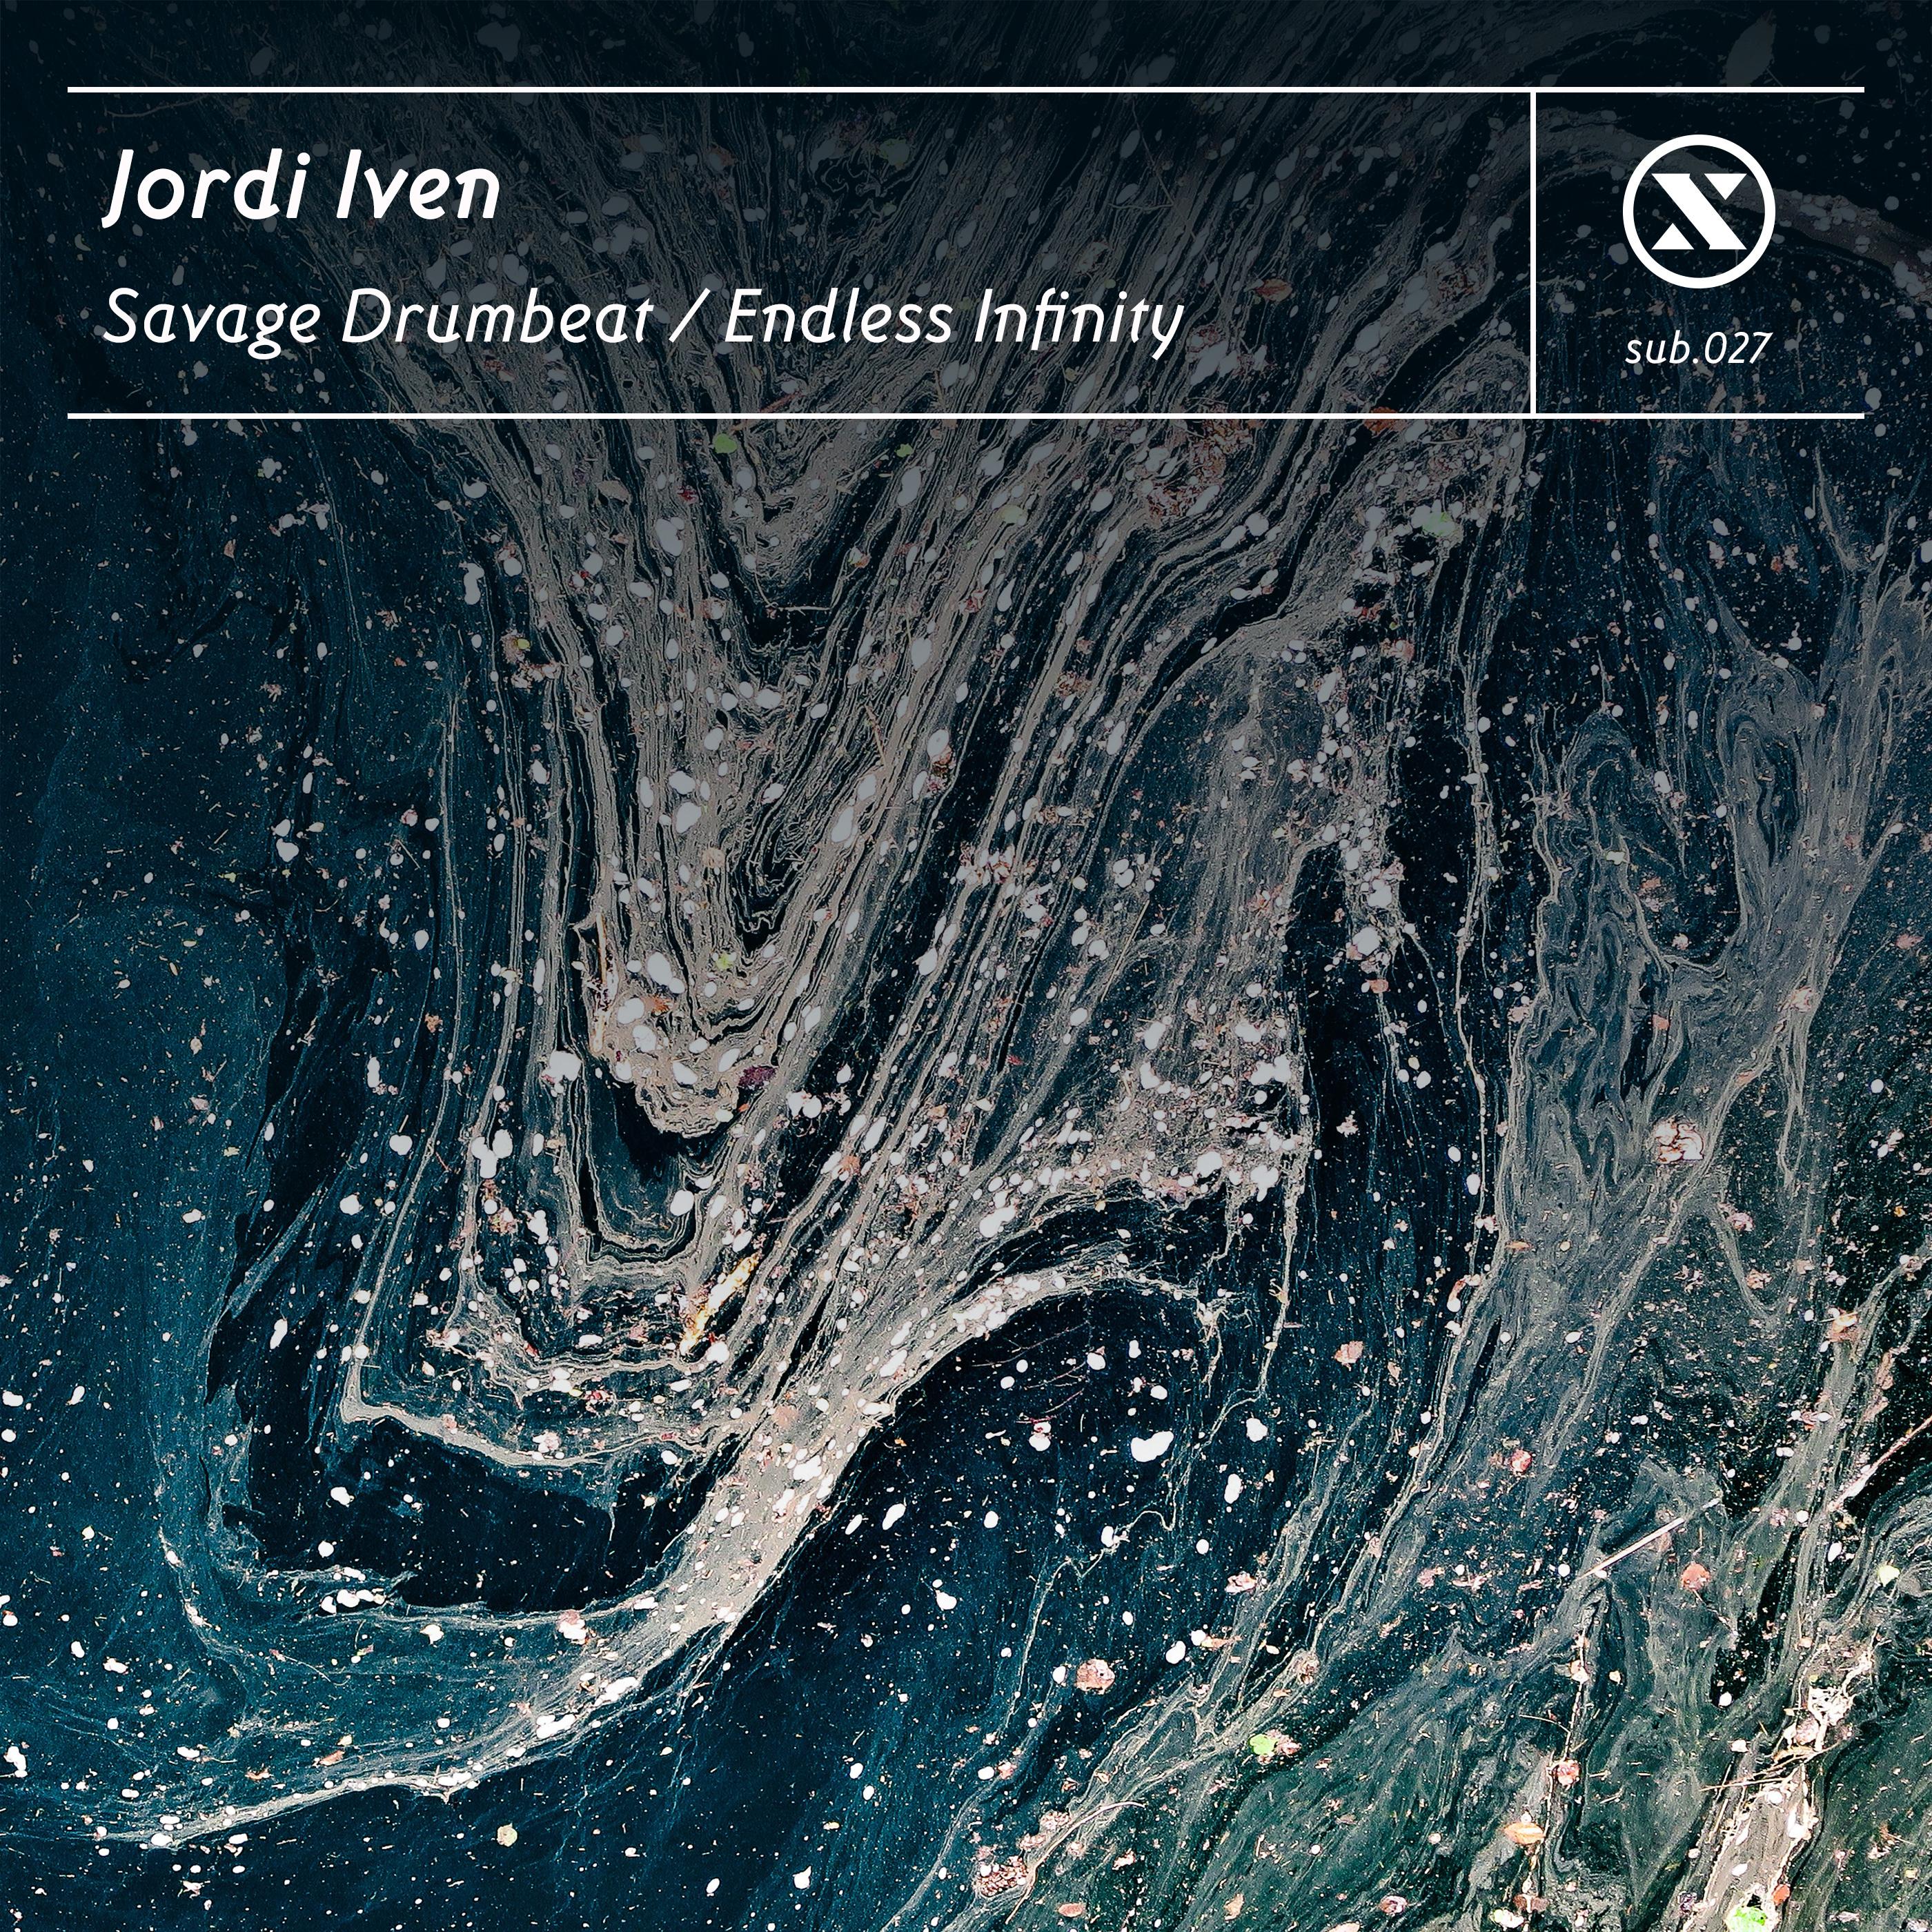 subdrive-label-jordiiven-sub027-web@2x